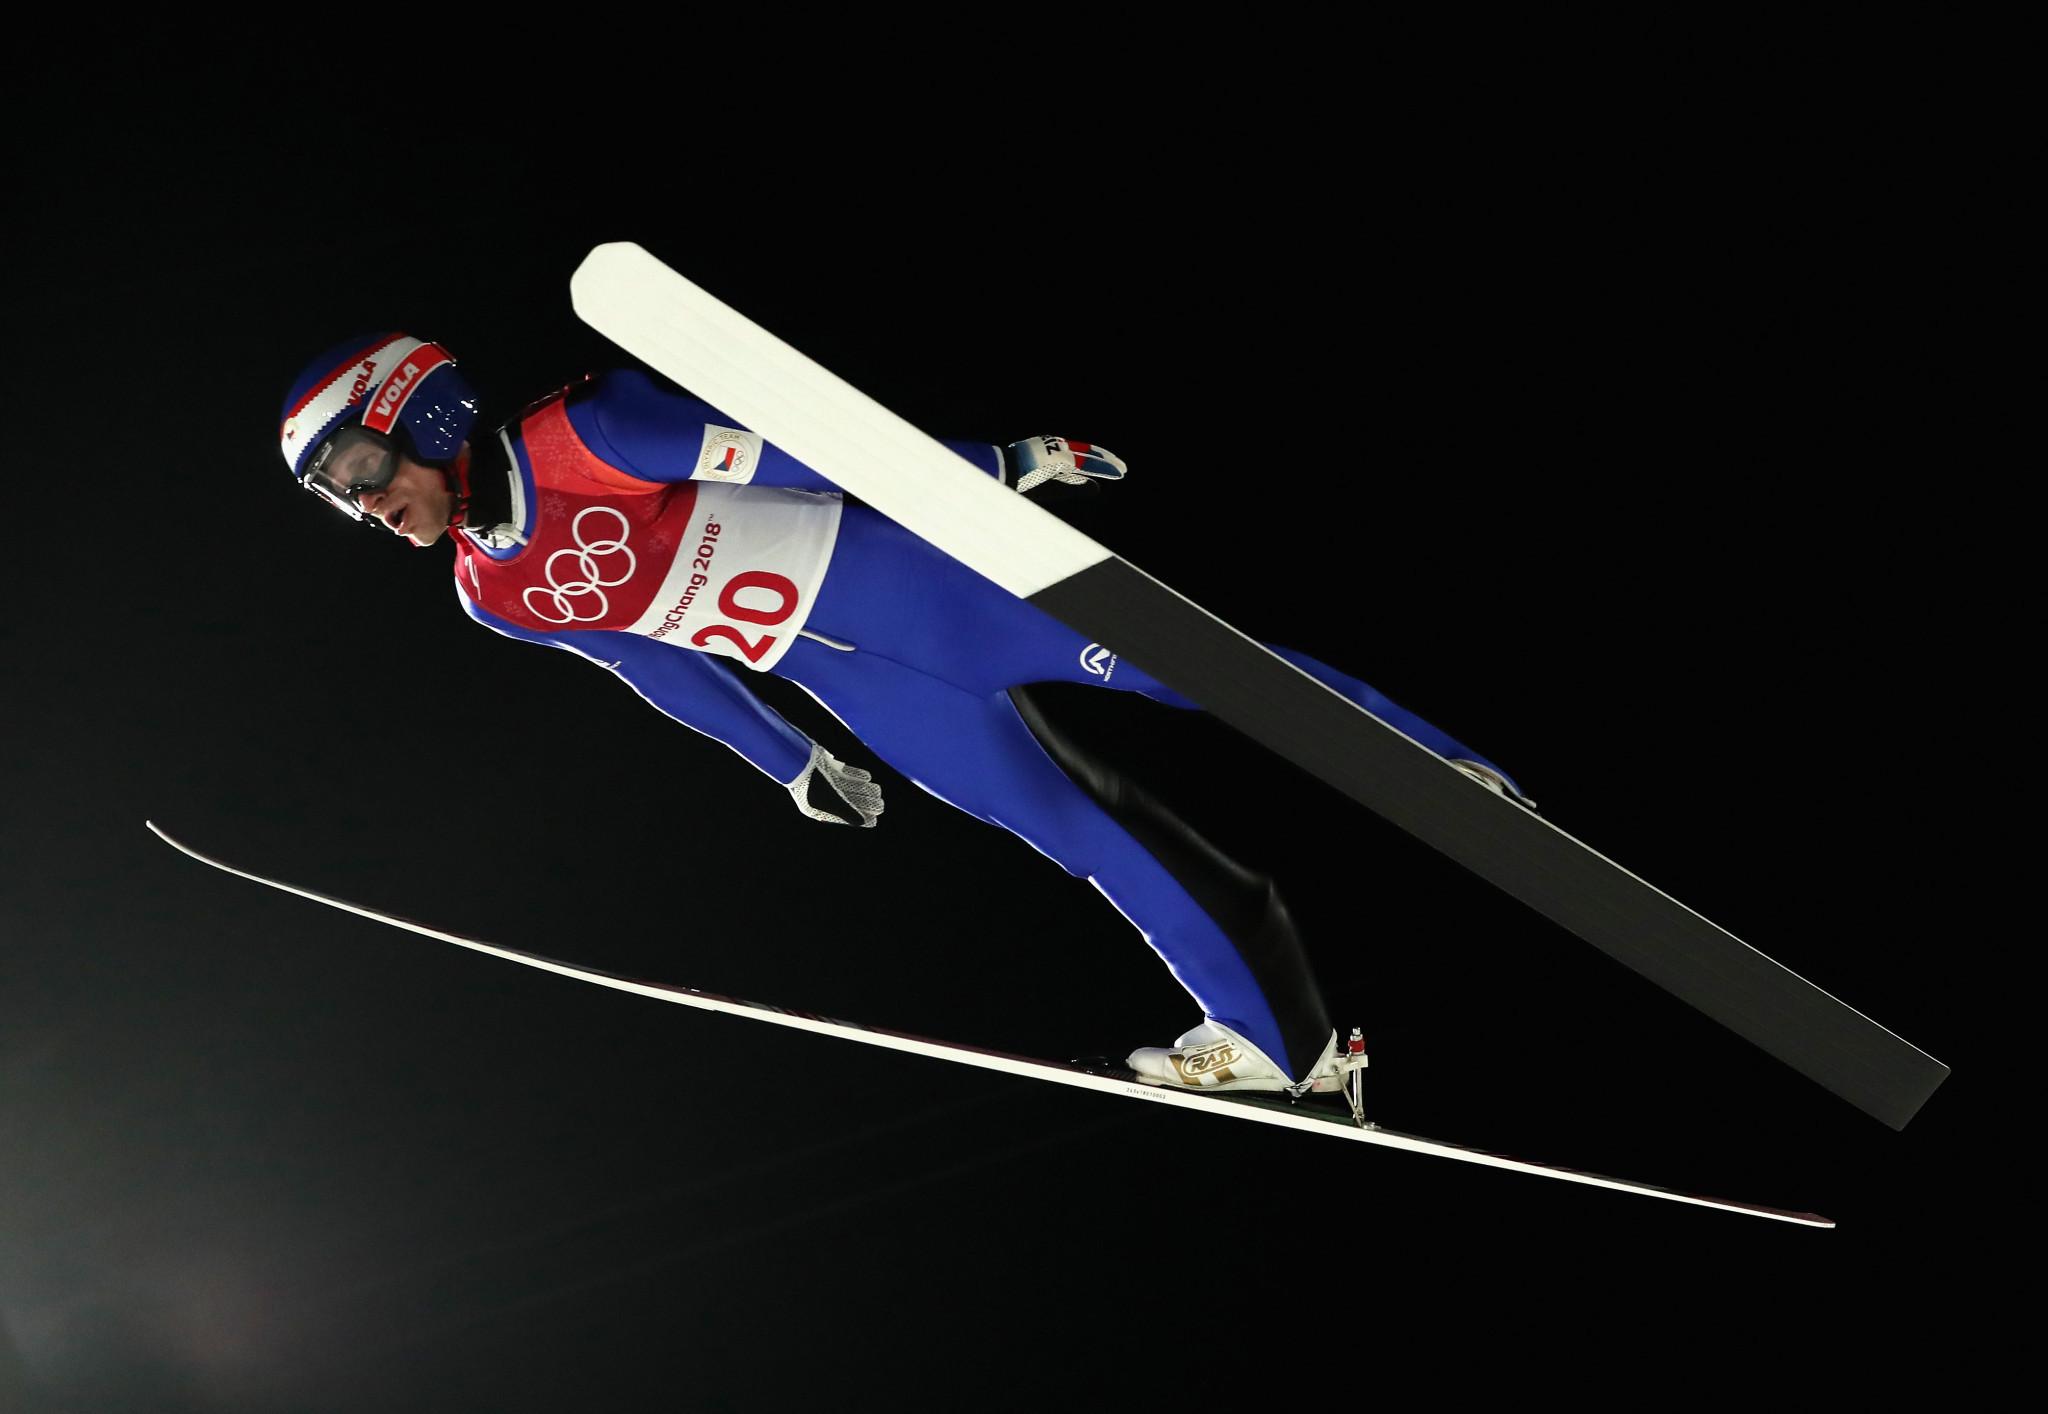 Bajc returns as Czech men's ski jumping coach after 15 years